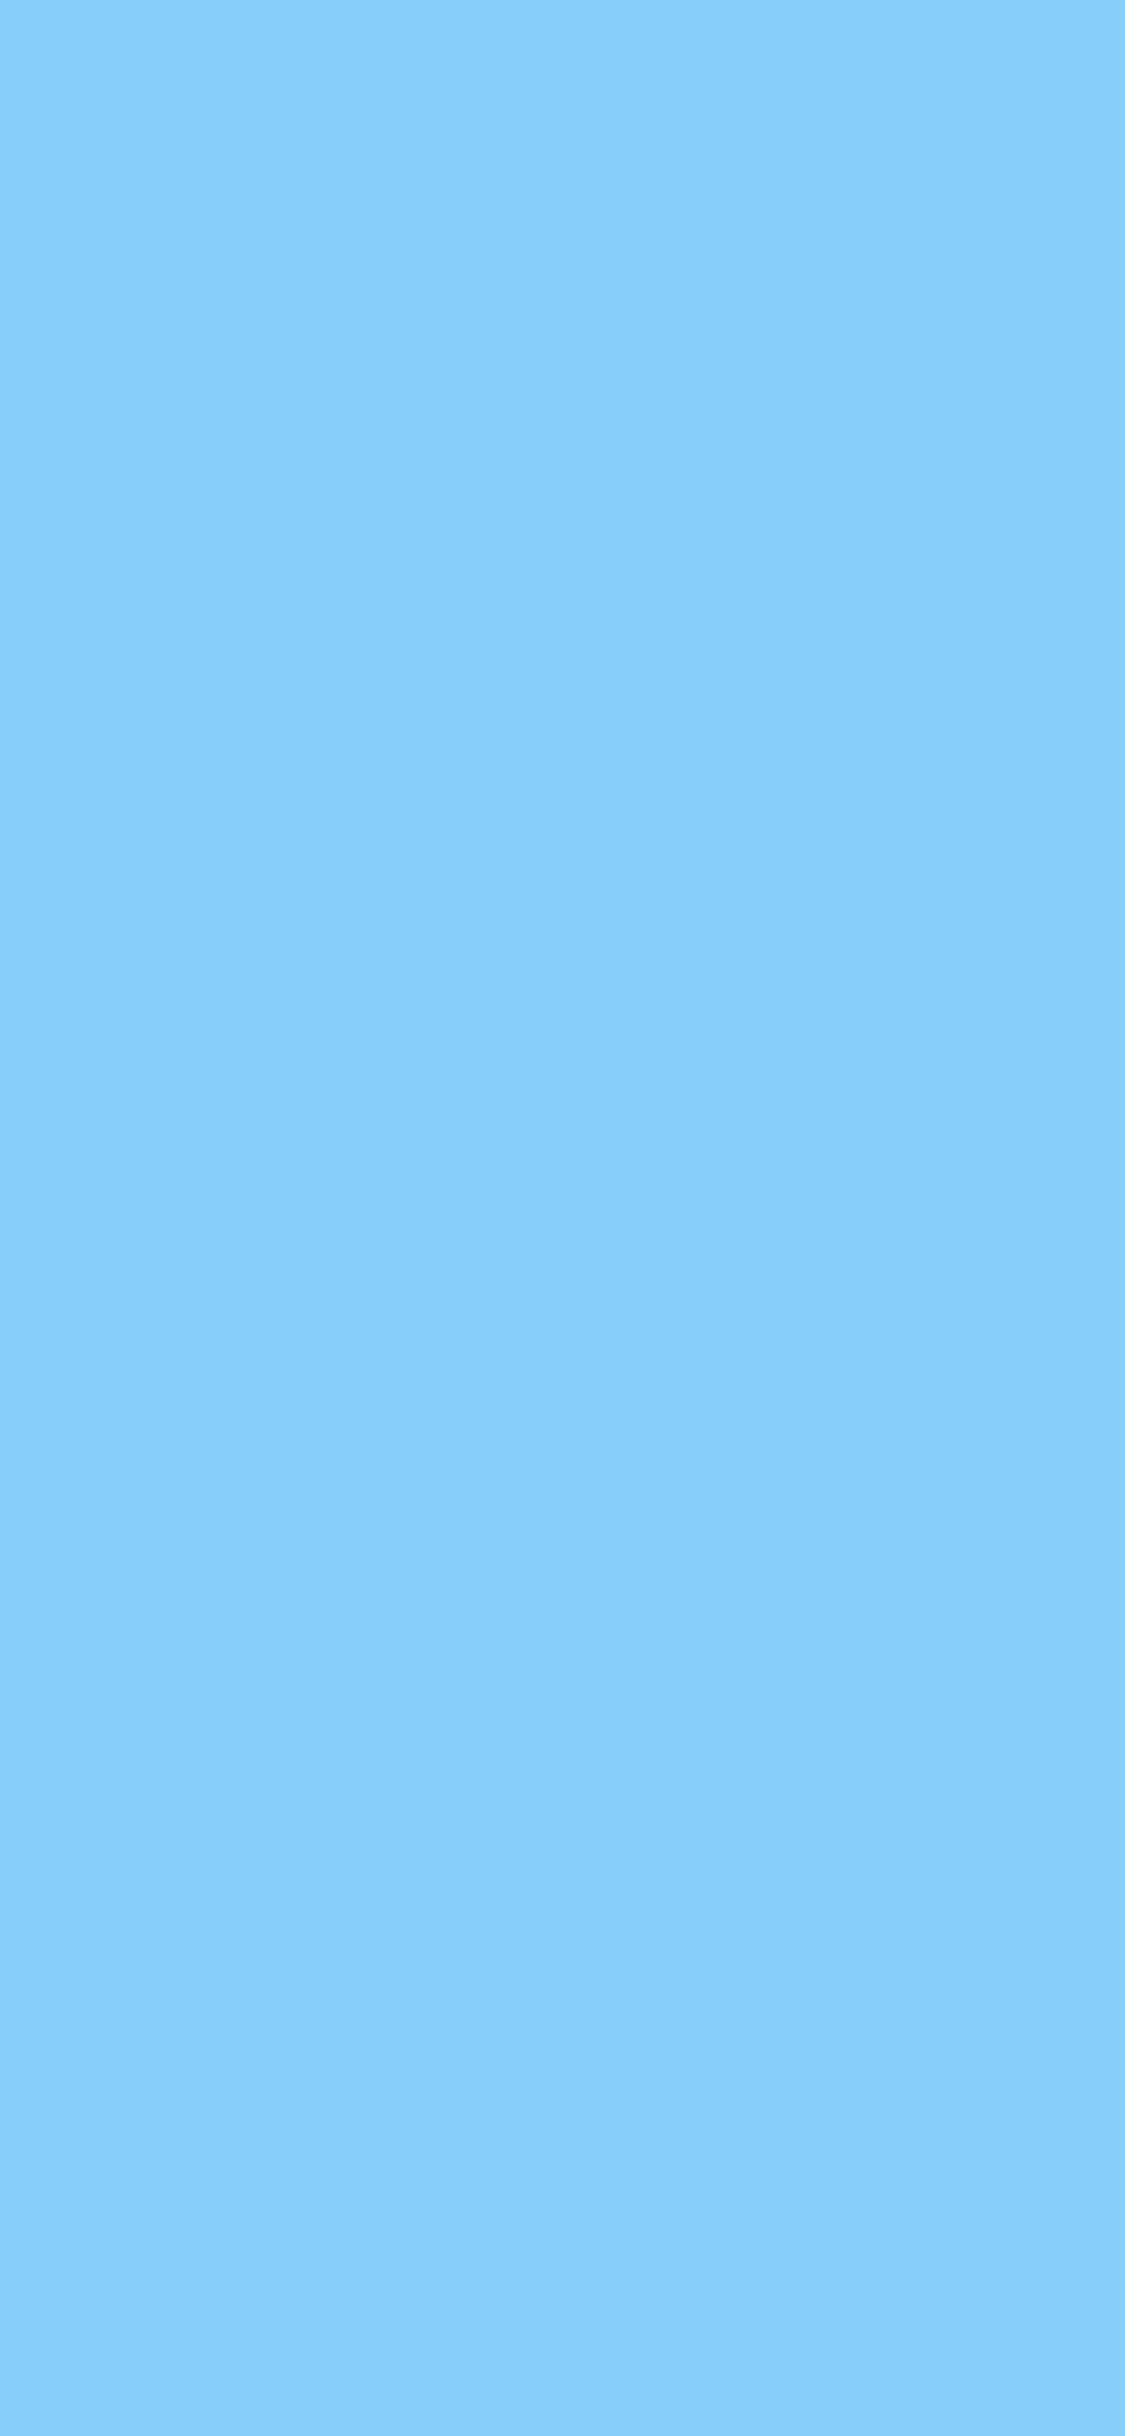 1125x2436 Light Sky Blue Solid Color Background